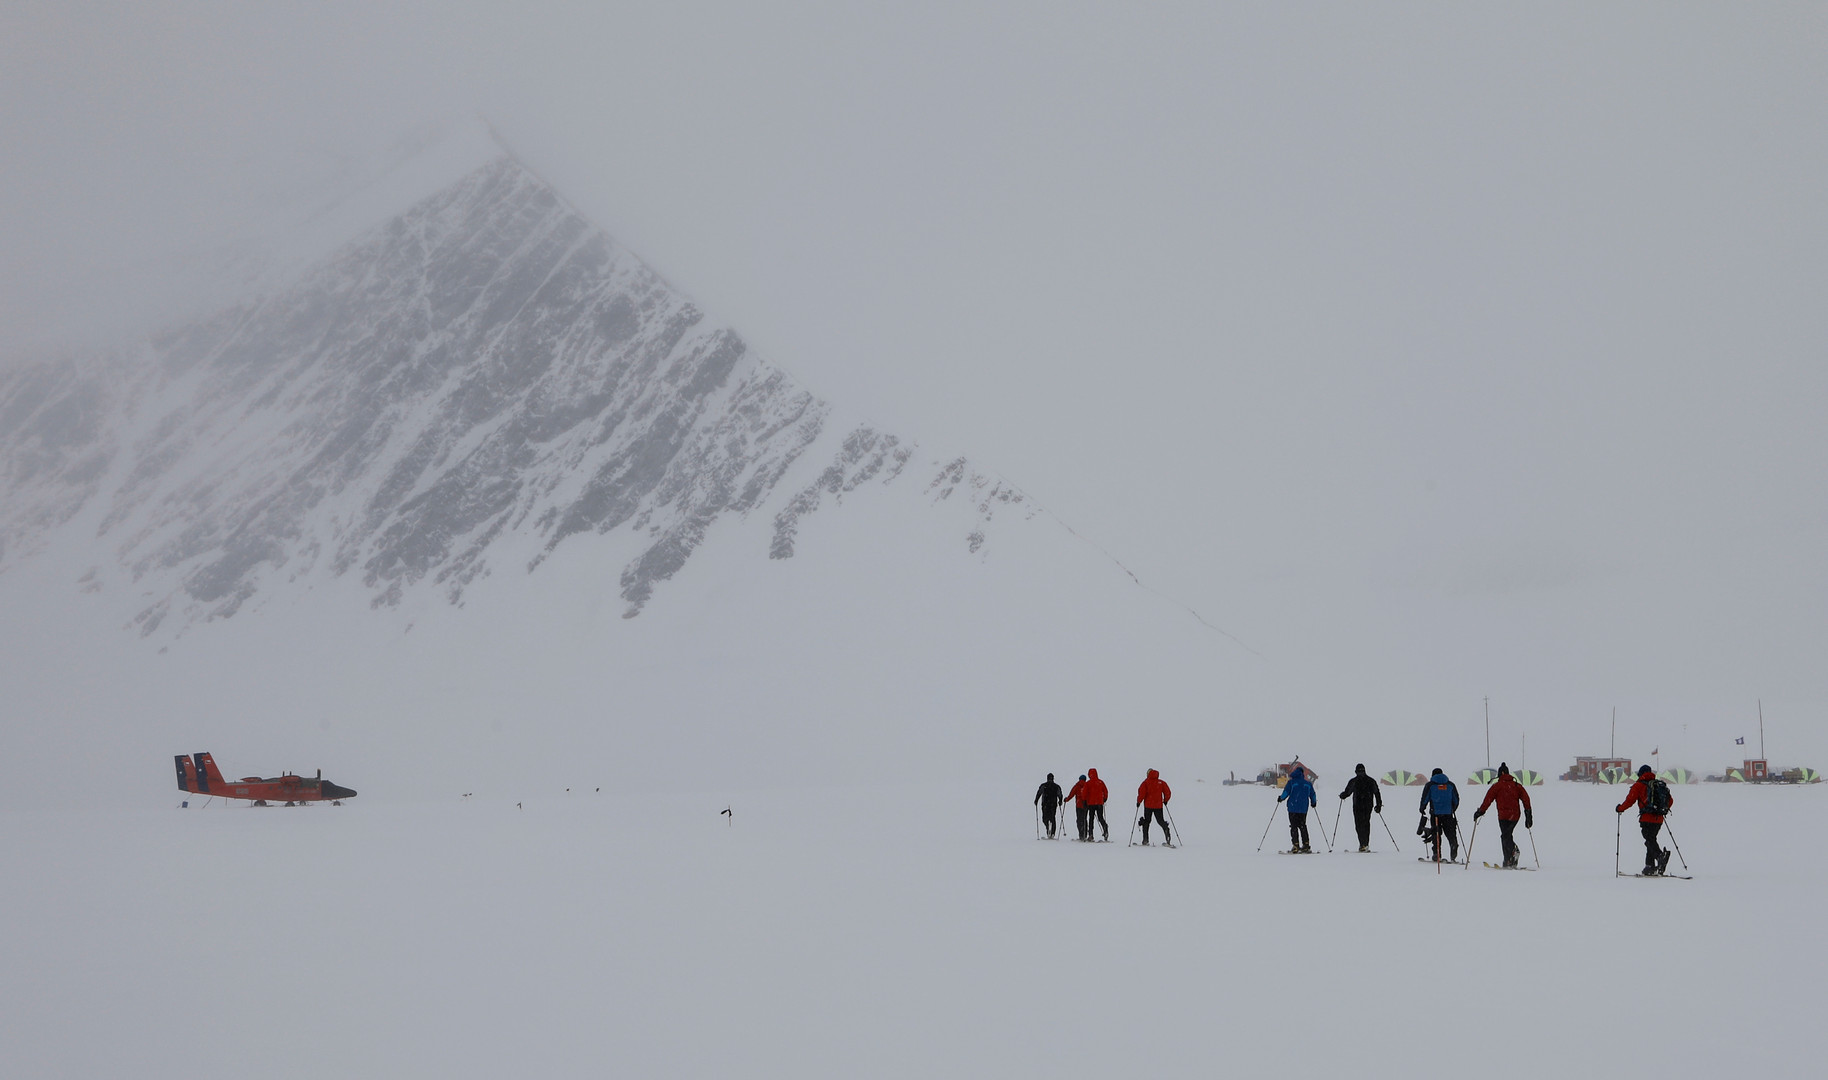 INACH.Glaciar.Union.2018.006.JPG